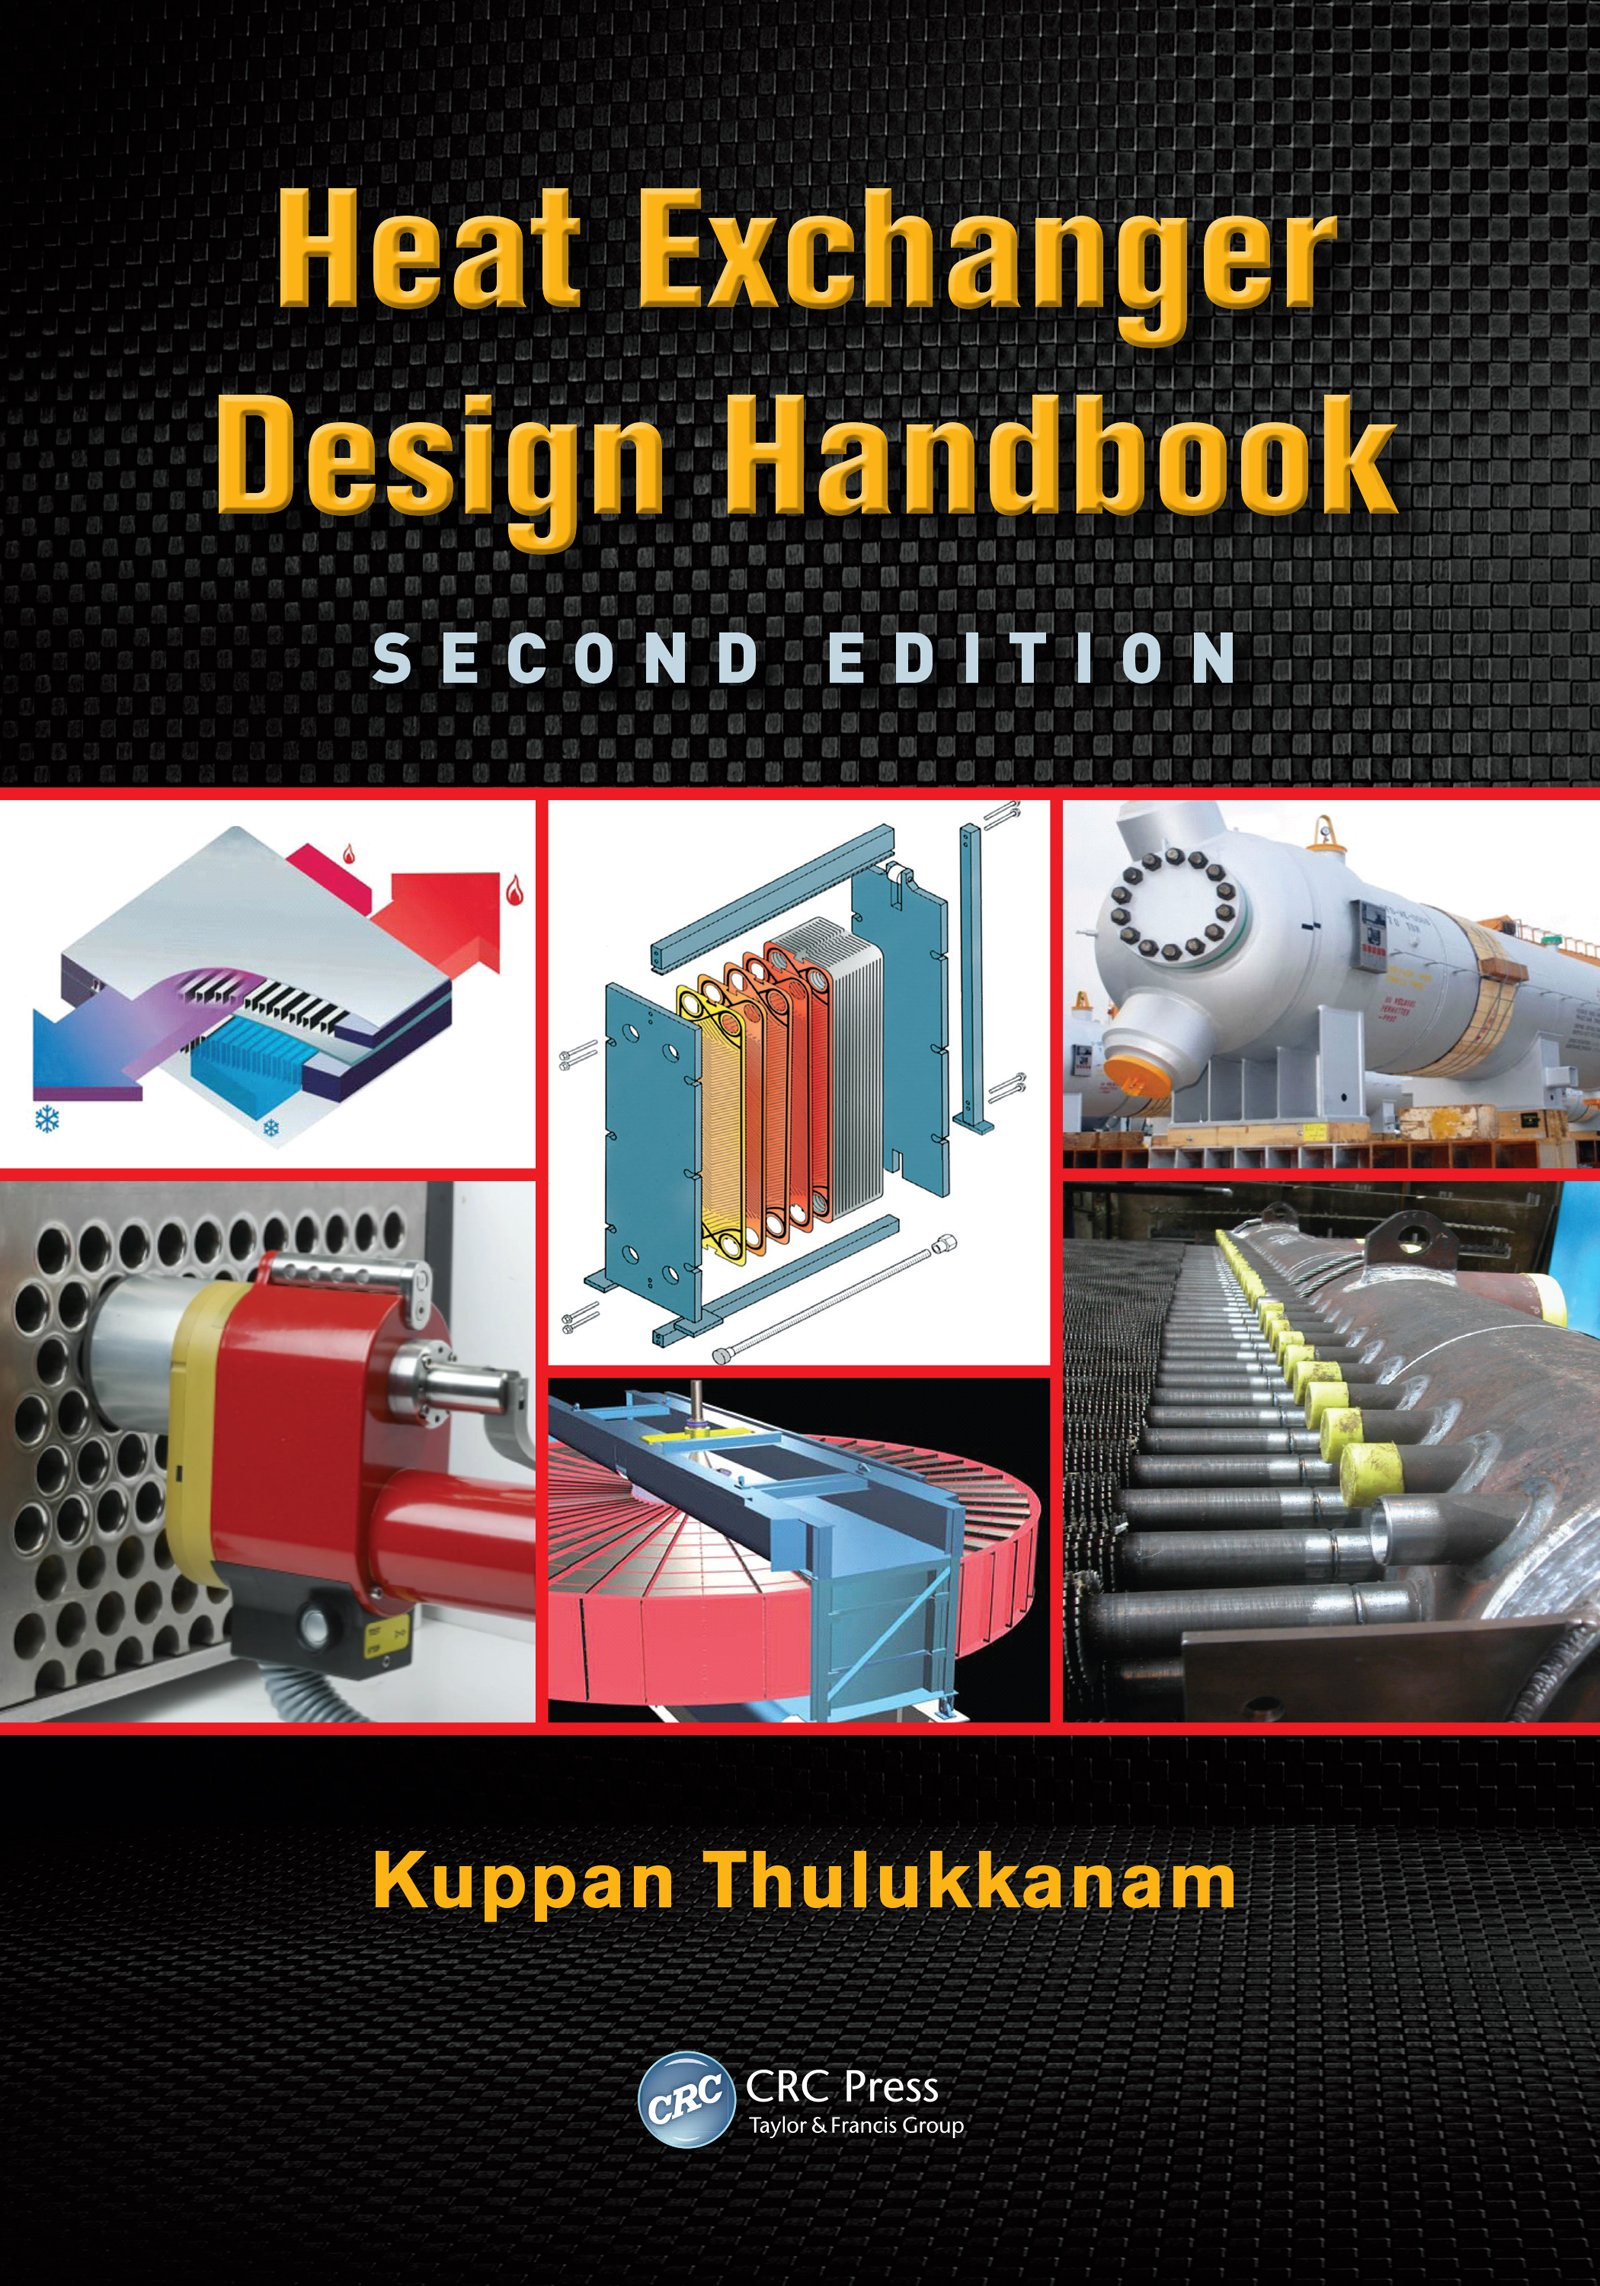 Heat Exchanger Design Handbook Mechanical Engineering 222 2 Thulukkanam Kuppan Amazon Com